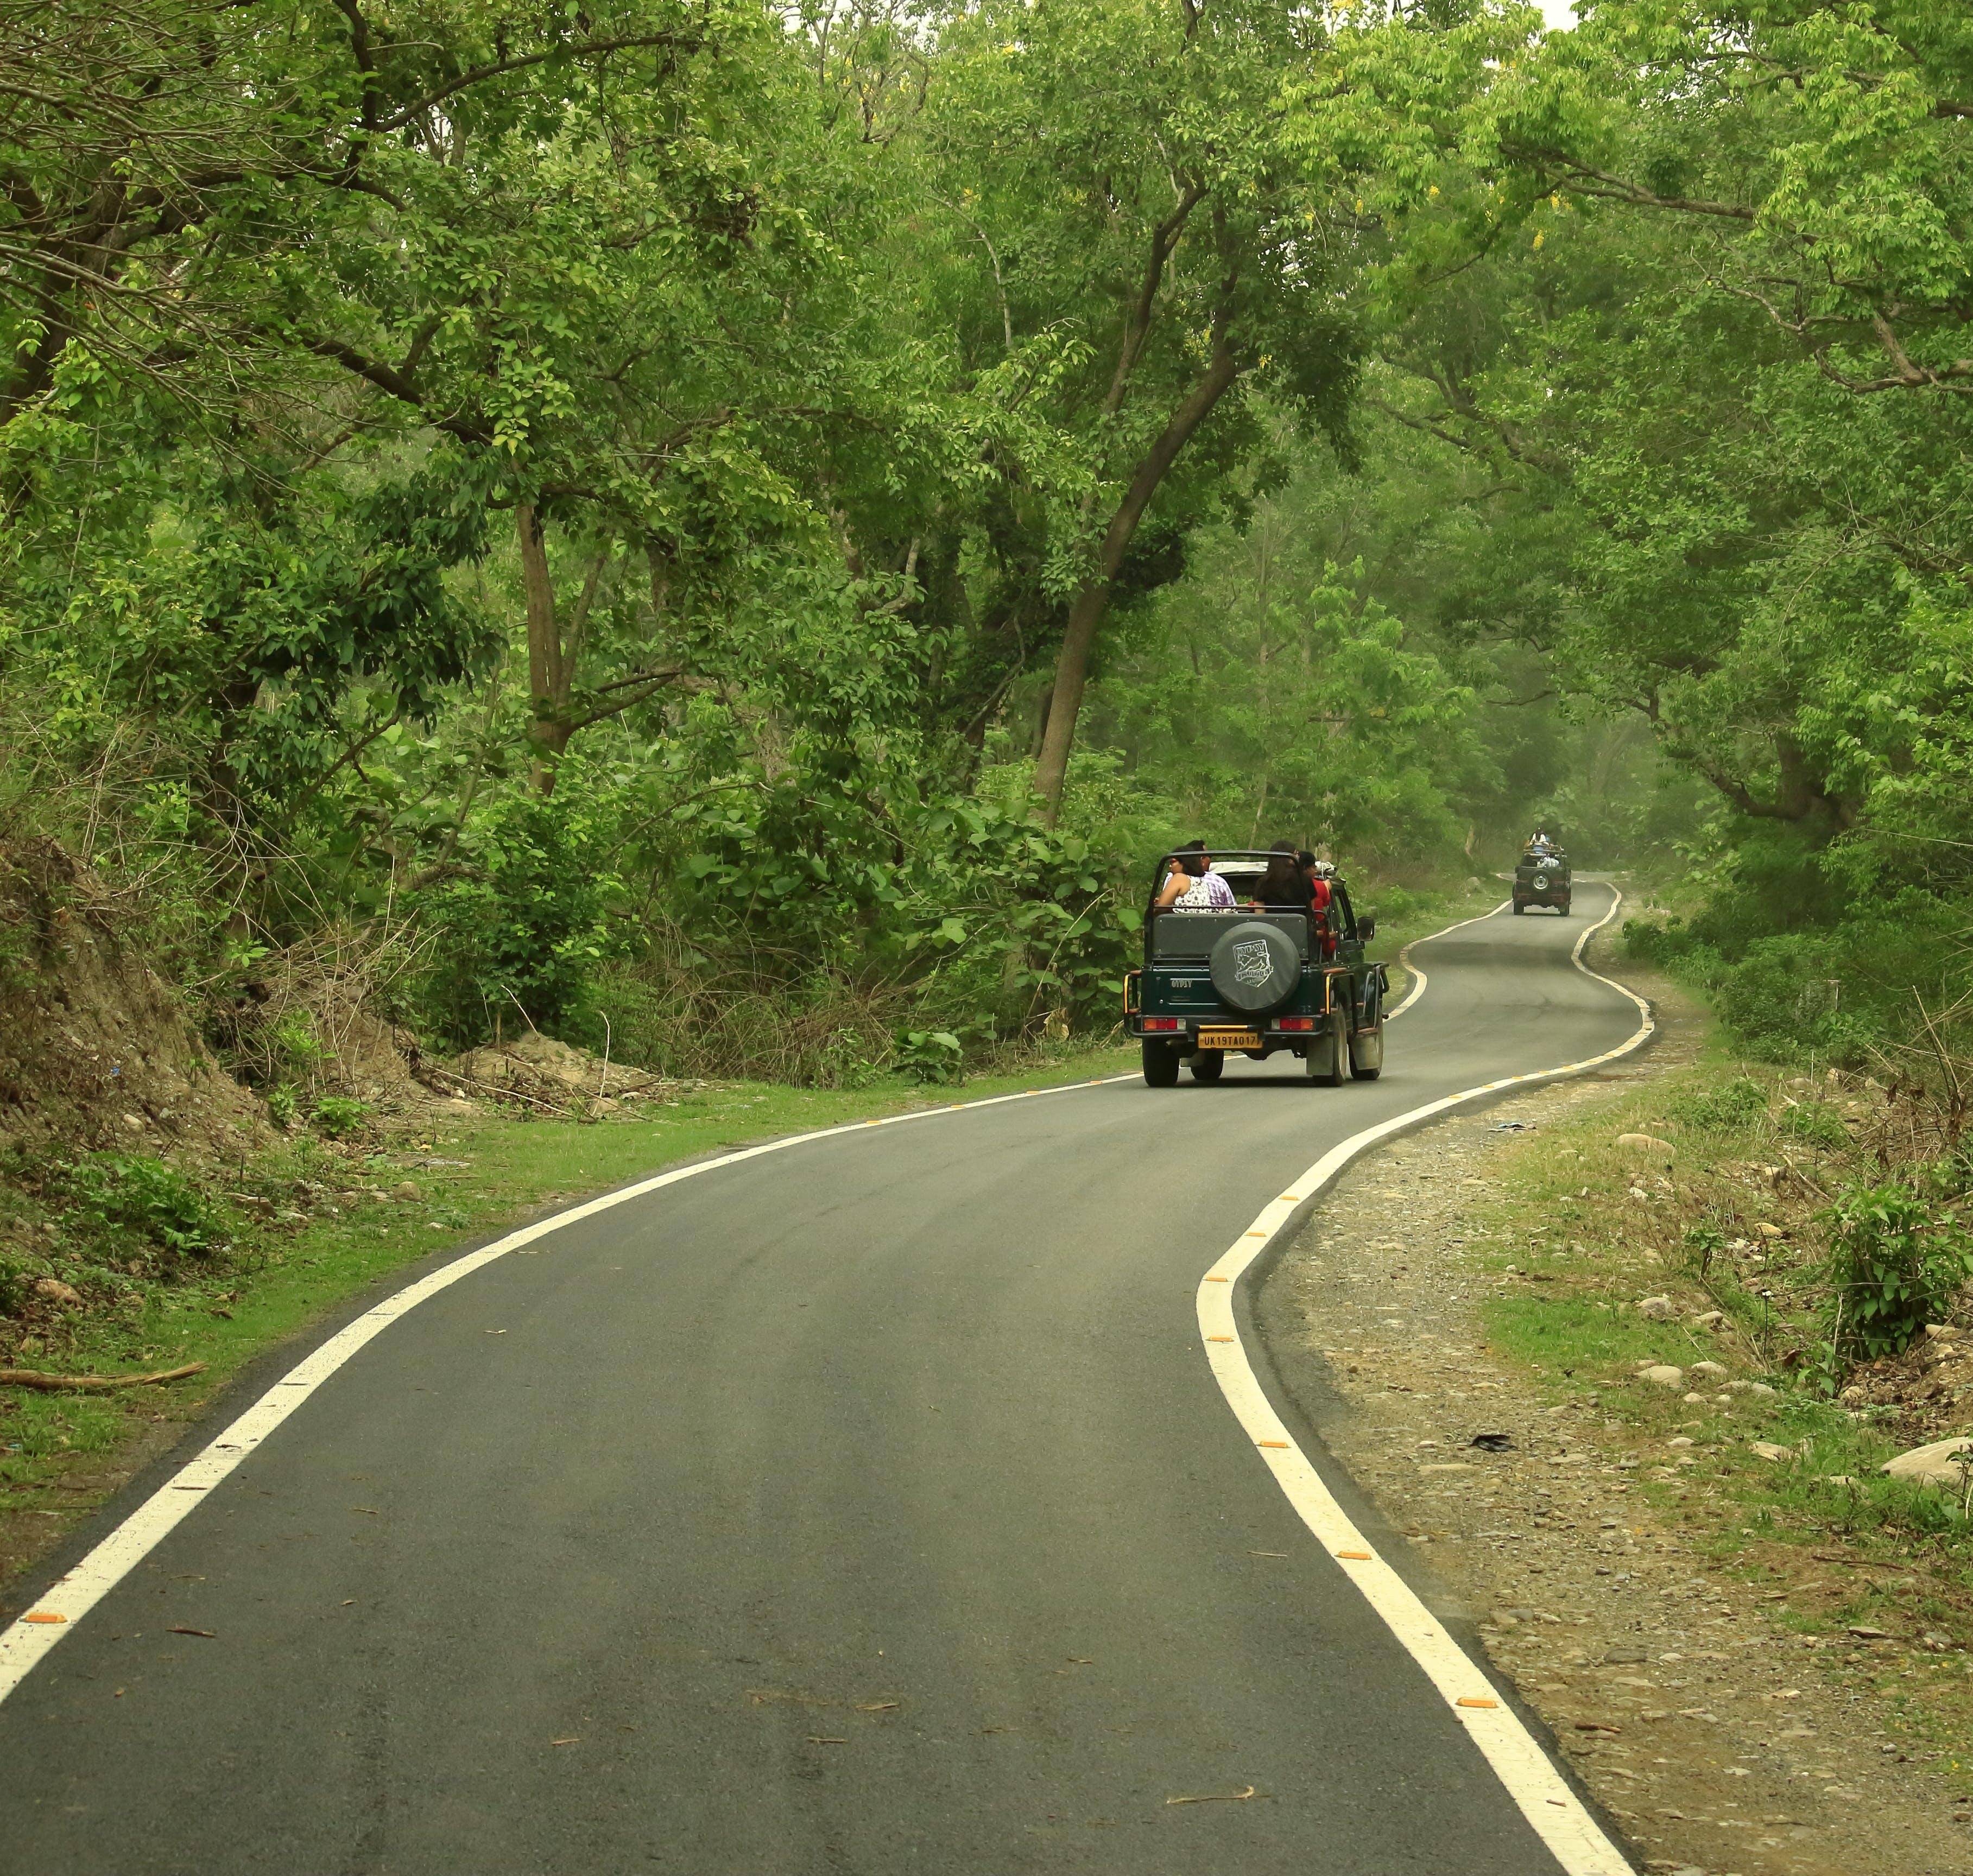 Gratis stockfoto met #jeep #jimcorbett #tiger #safari #wildlife #roads, #wildlifephotography #animal_captures #animals_in_